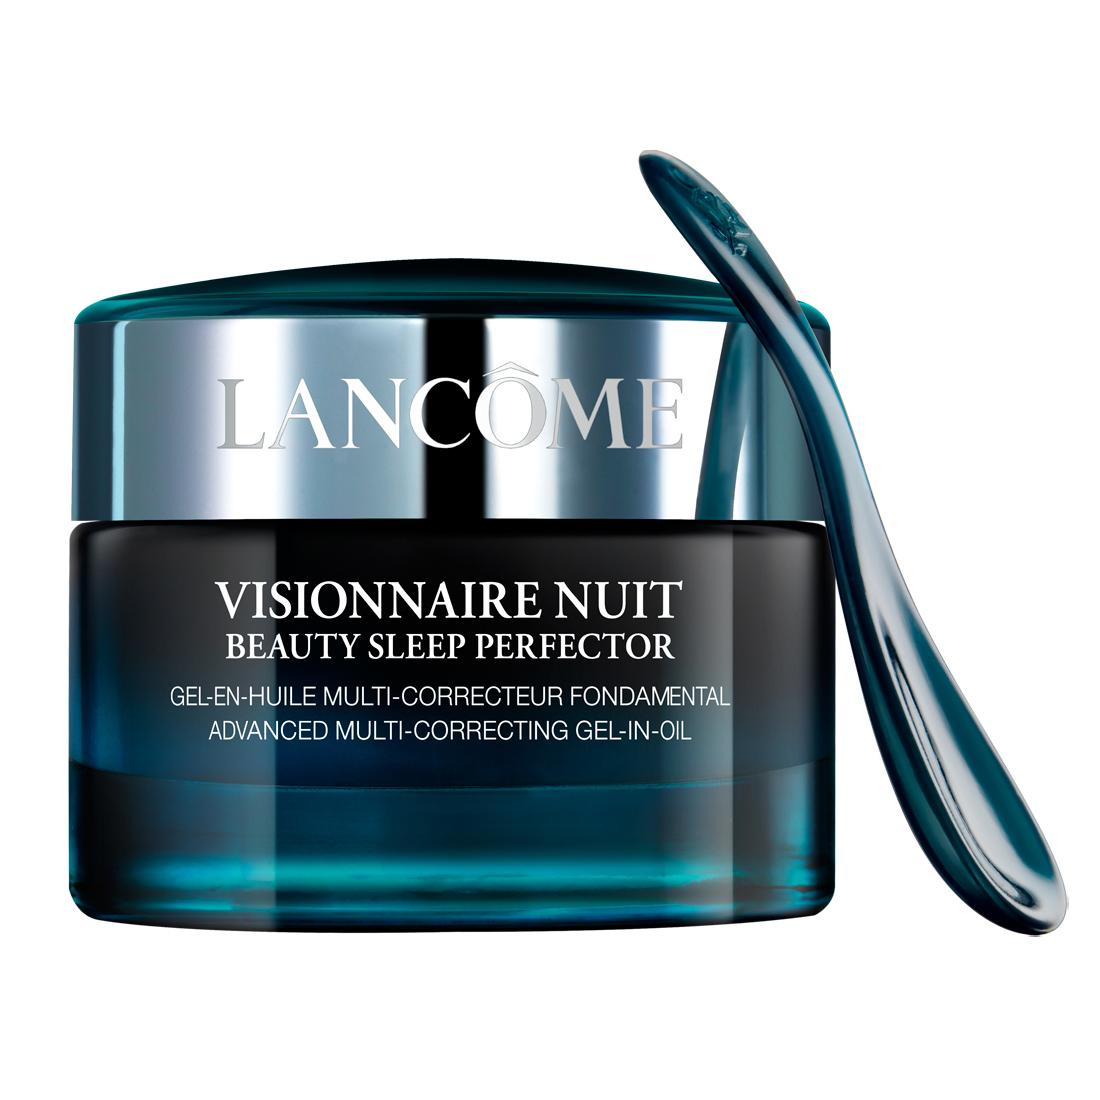 Lancôme - Visionnaire Nuit Beauty Sleep Perfector - Gel-en-Huile Multi-Correcteur 50 ml